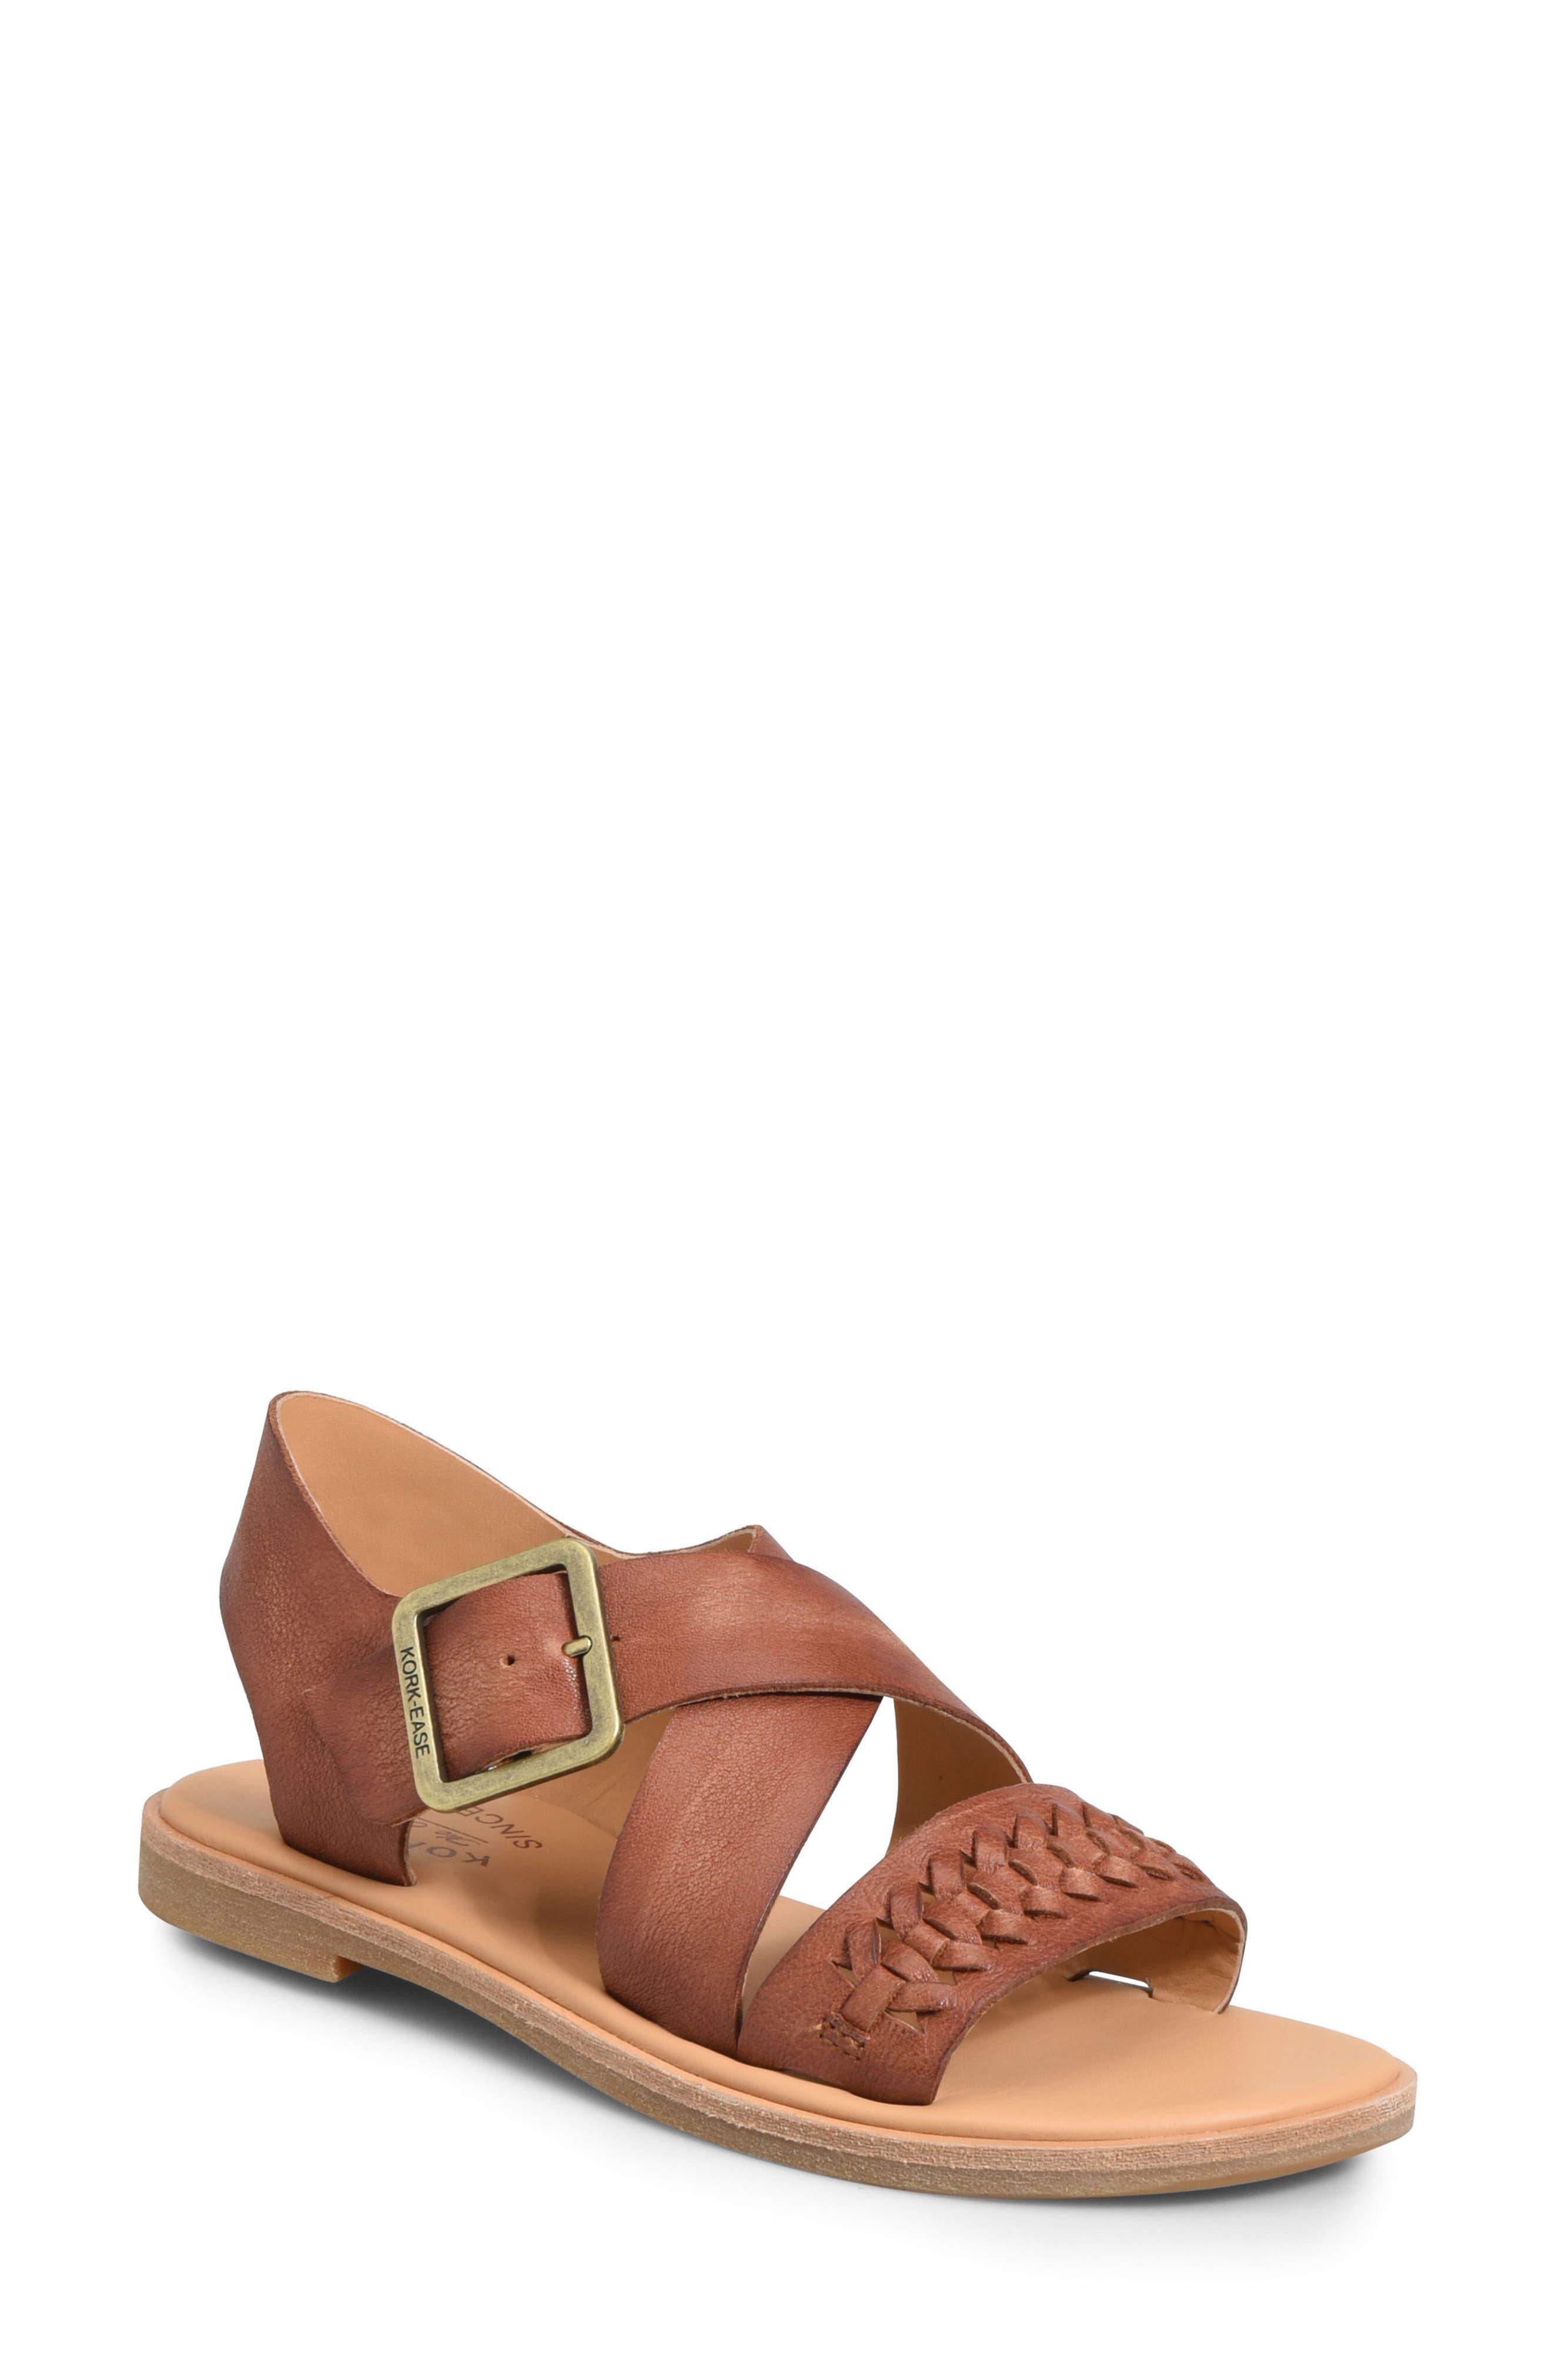 Nara Braid Sandal,                             Main thumbnail 1, color,                             BROWN LEATHER